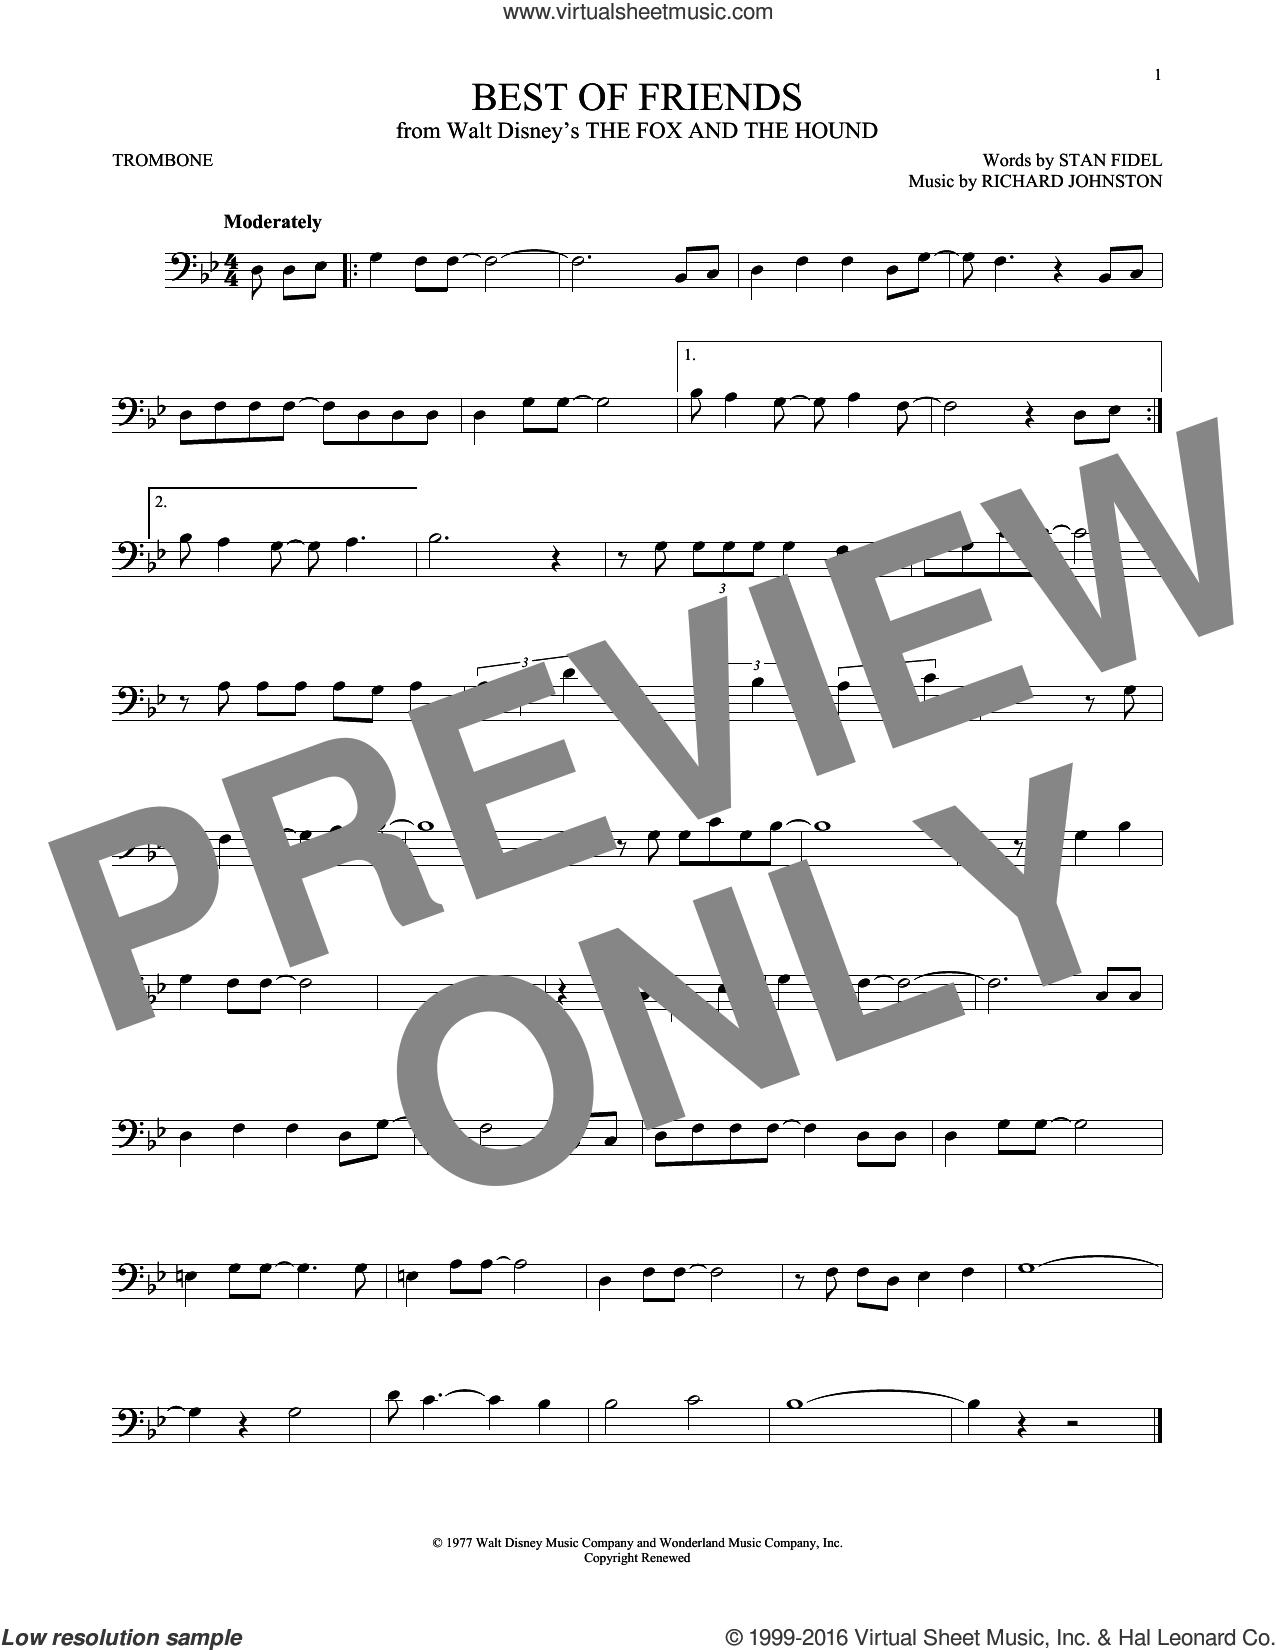 Best Of Friends sheet music for trombone solo by Richard Johnston and Stan Fidel, intermediate skill level